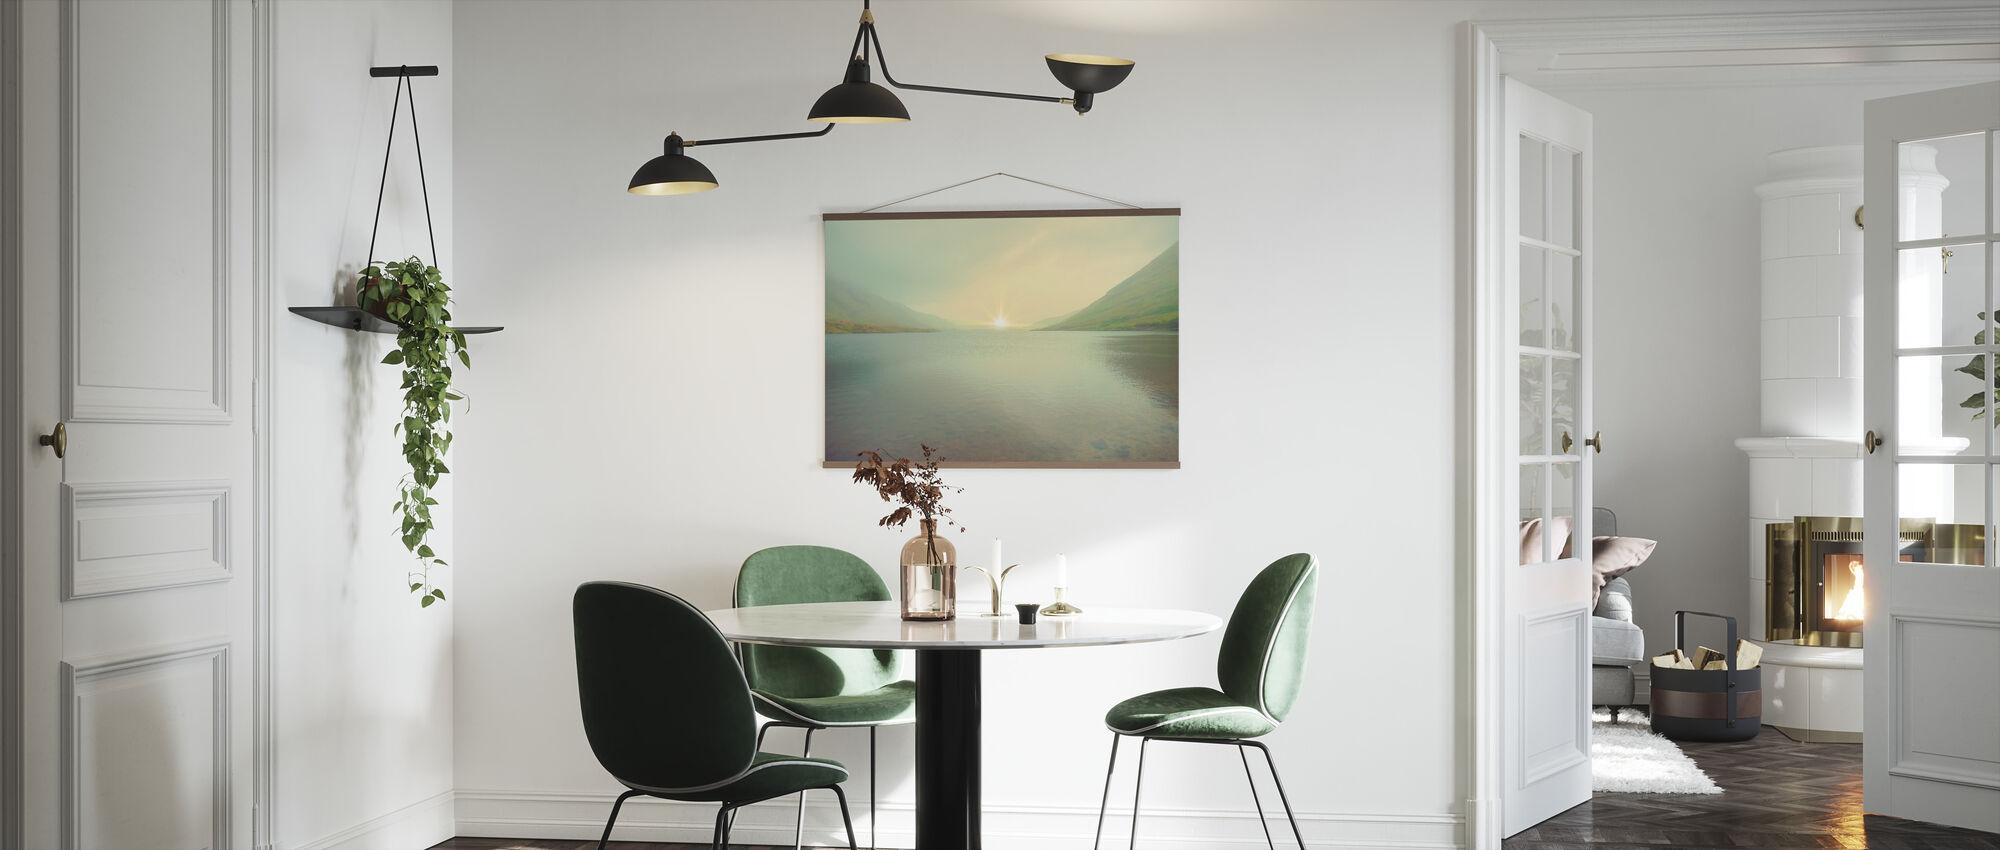 Iridescent Sunrise - Poster - Kitchen